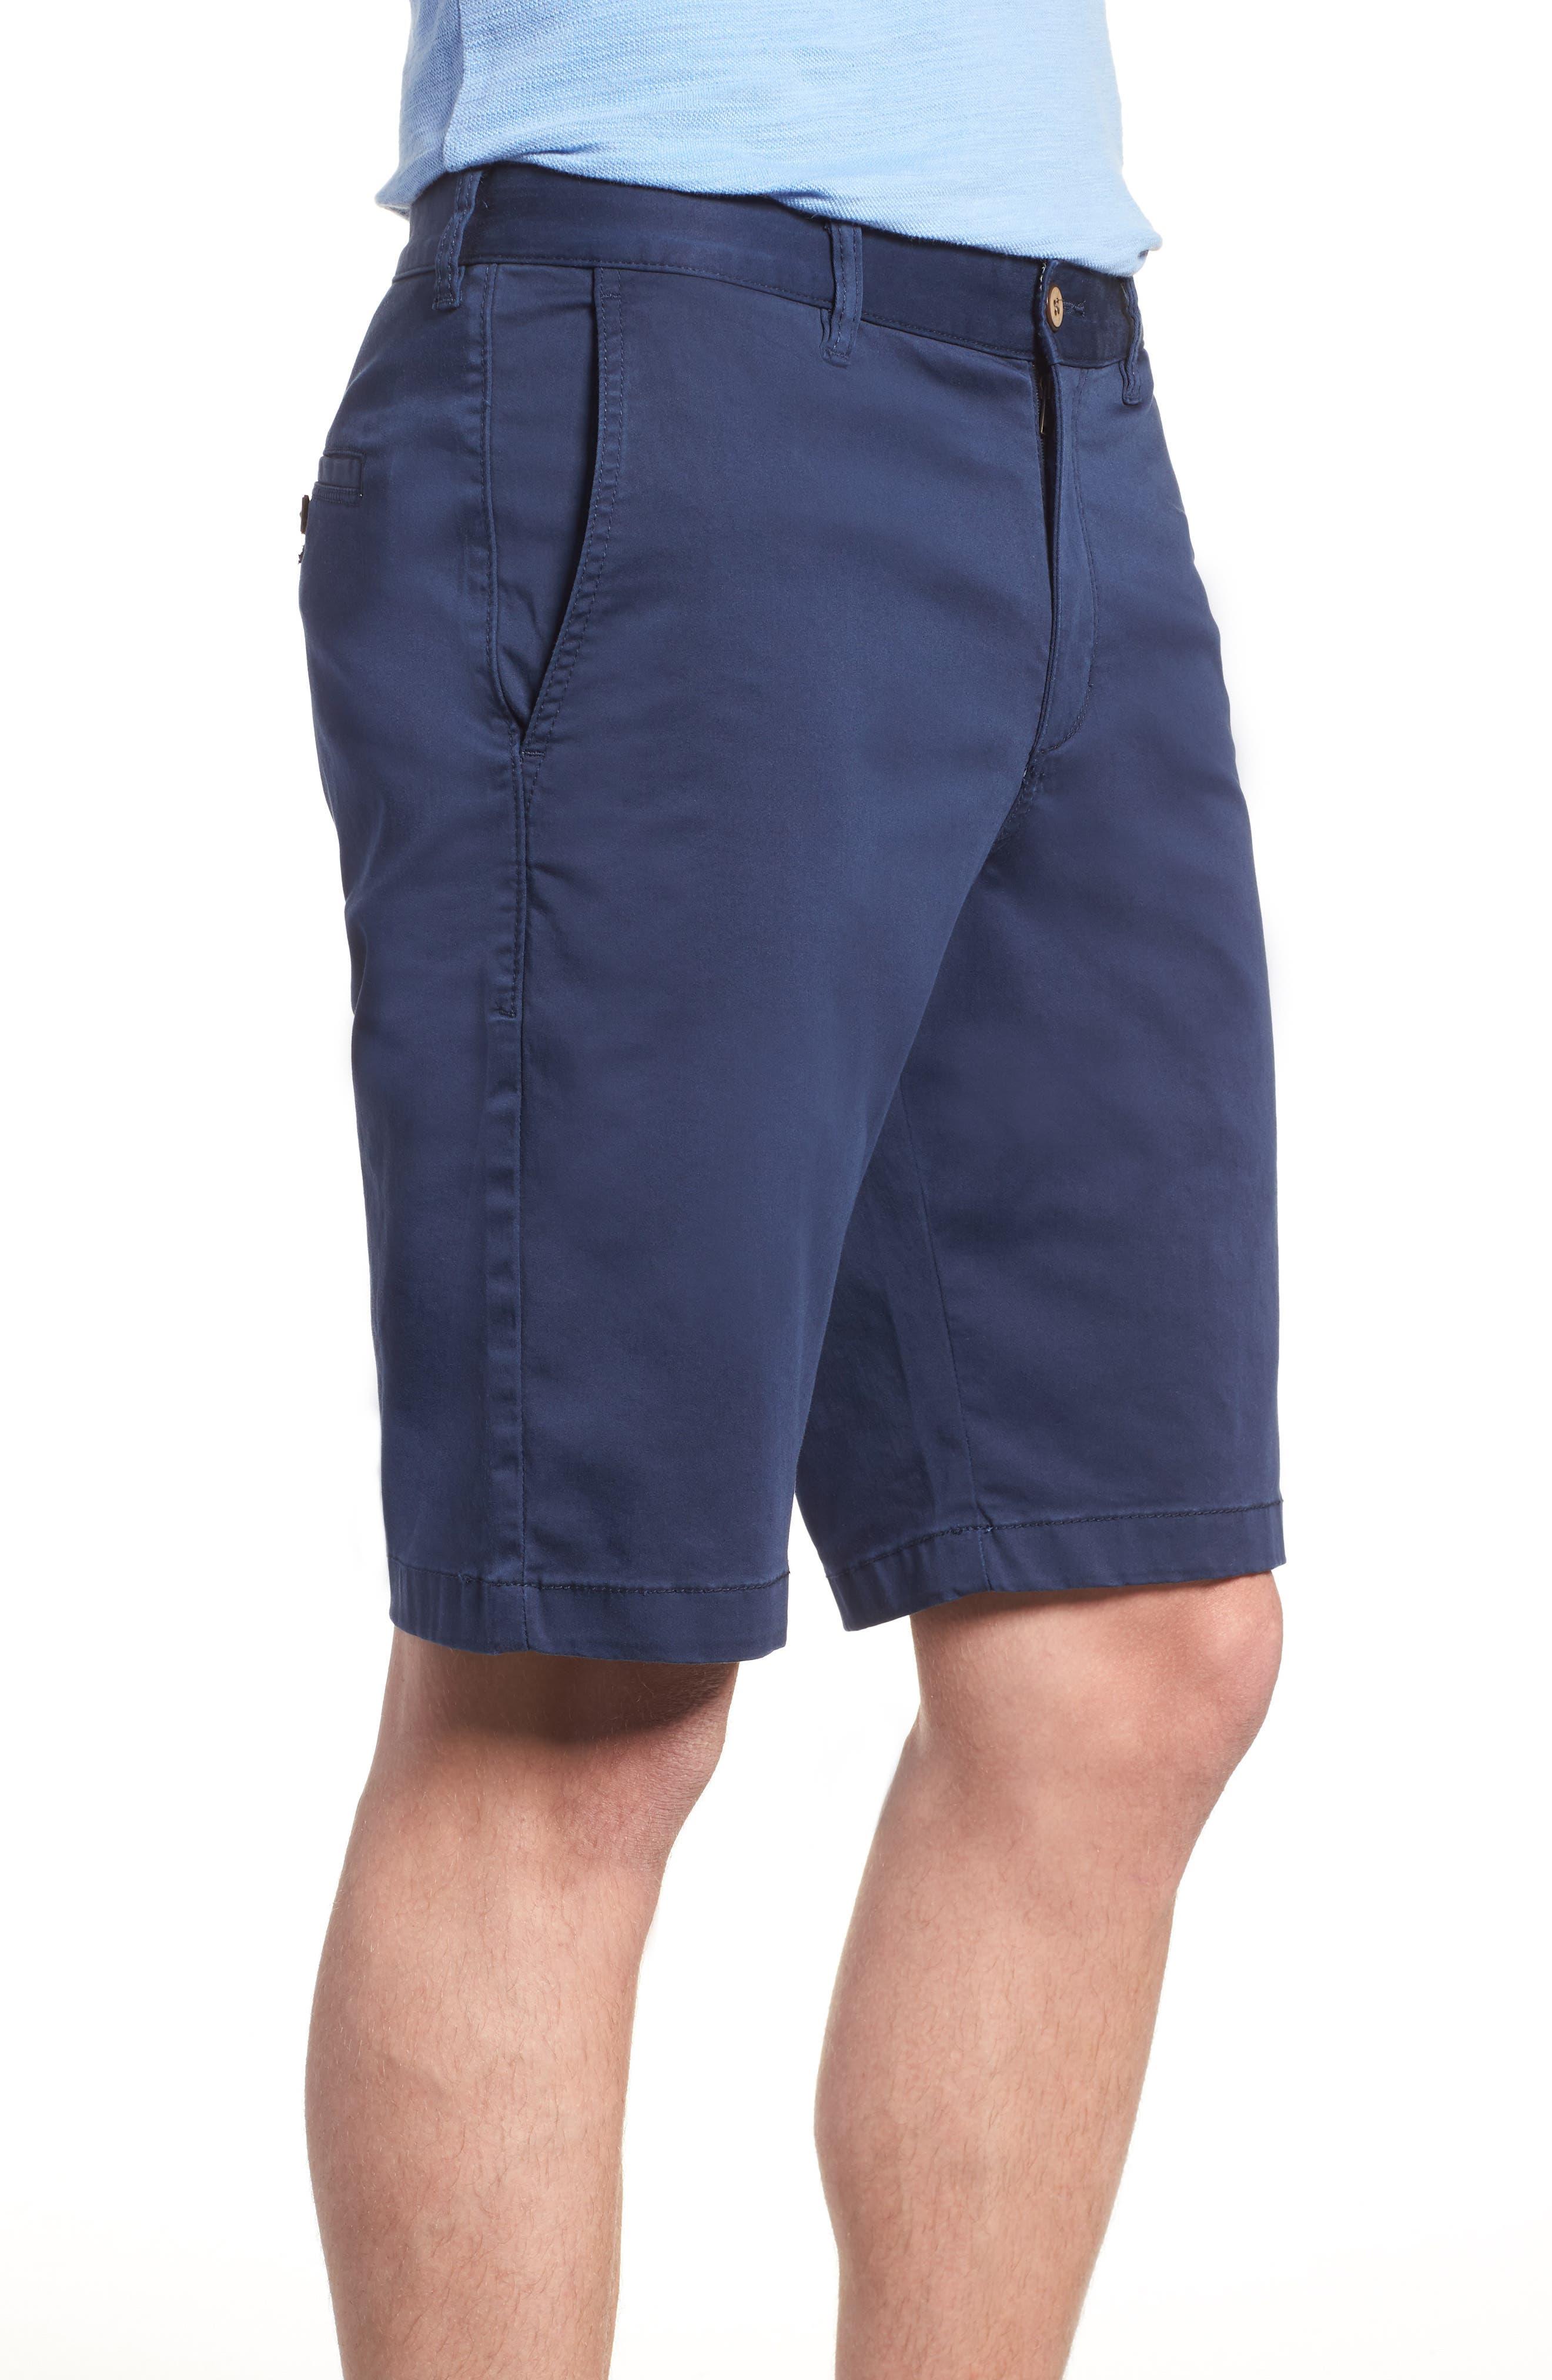 Boracay Chino Shorts,                             Alternate thumbnail 23, color,